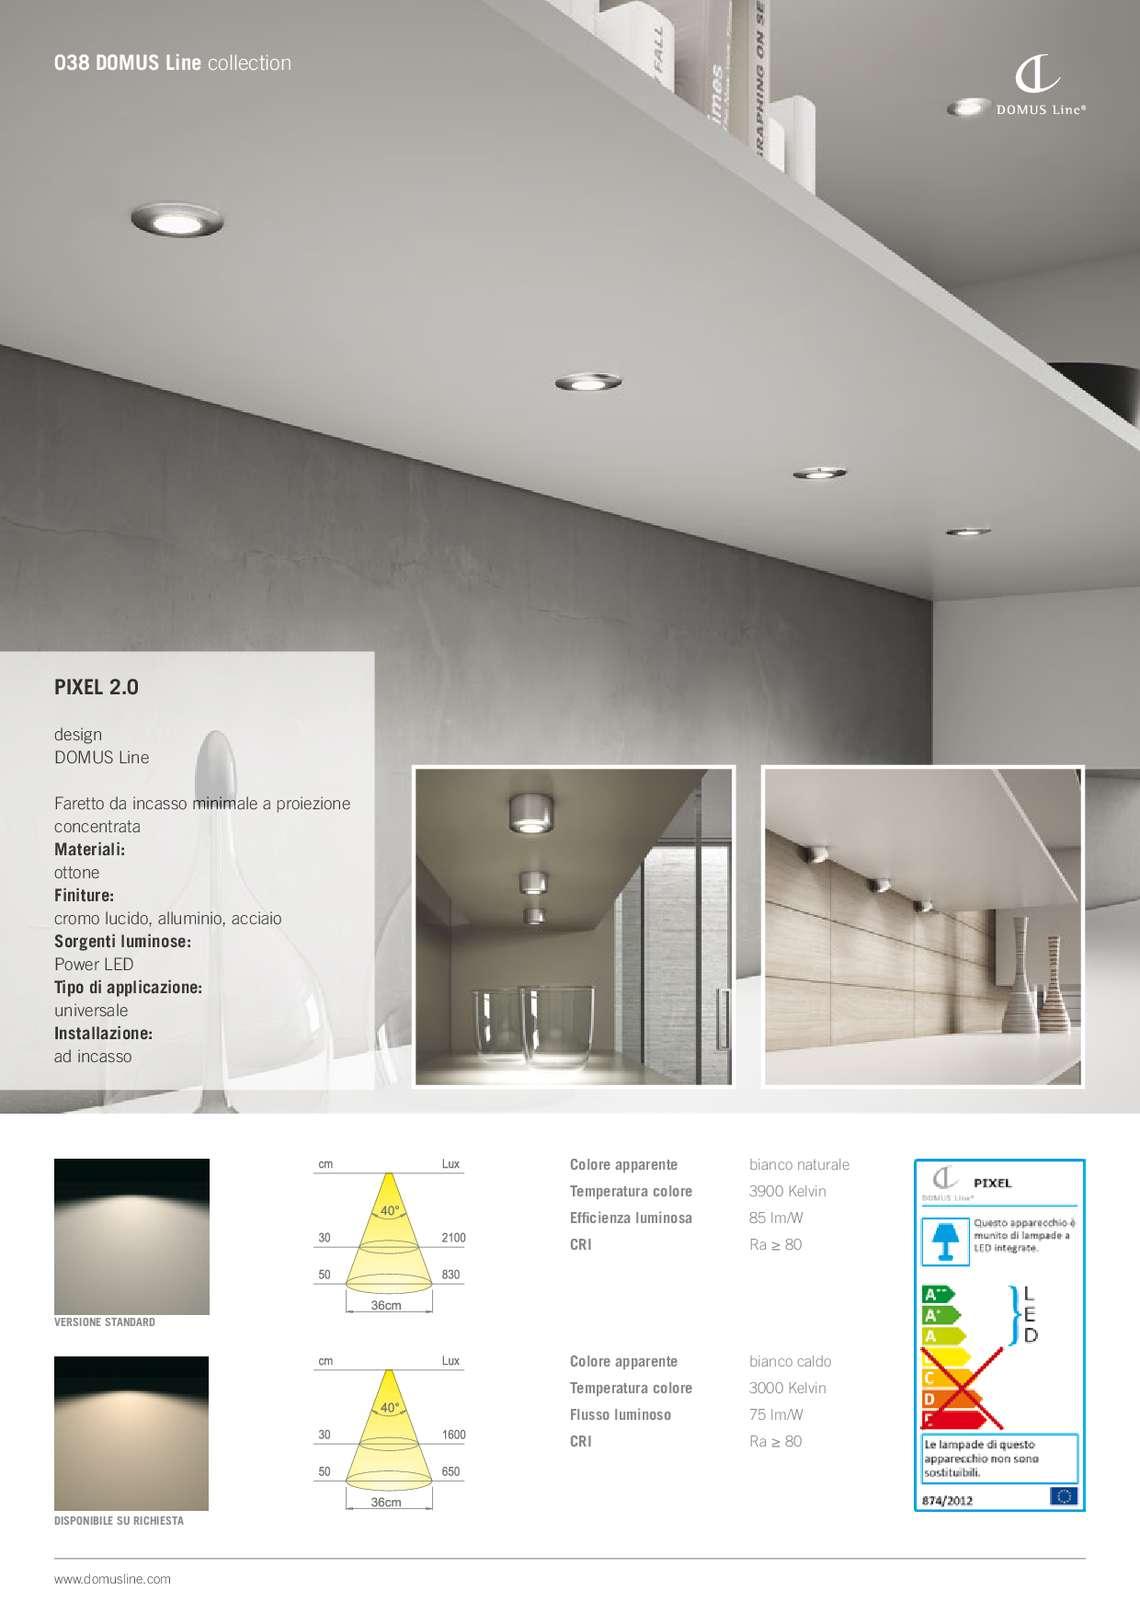 domus-line-illuminazione_26_038.jpg